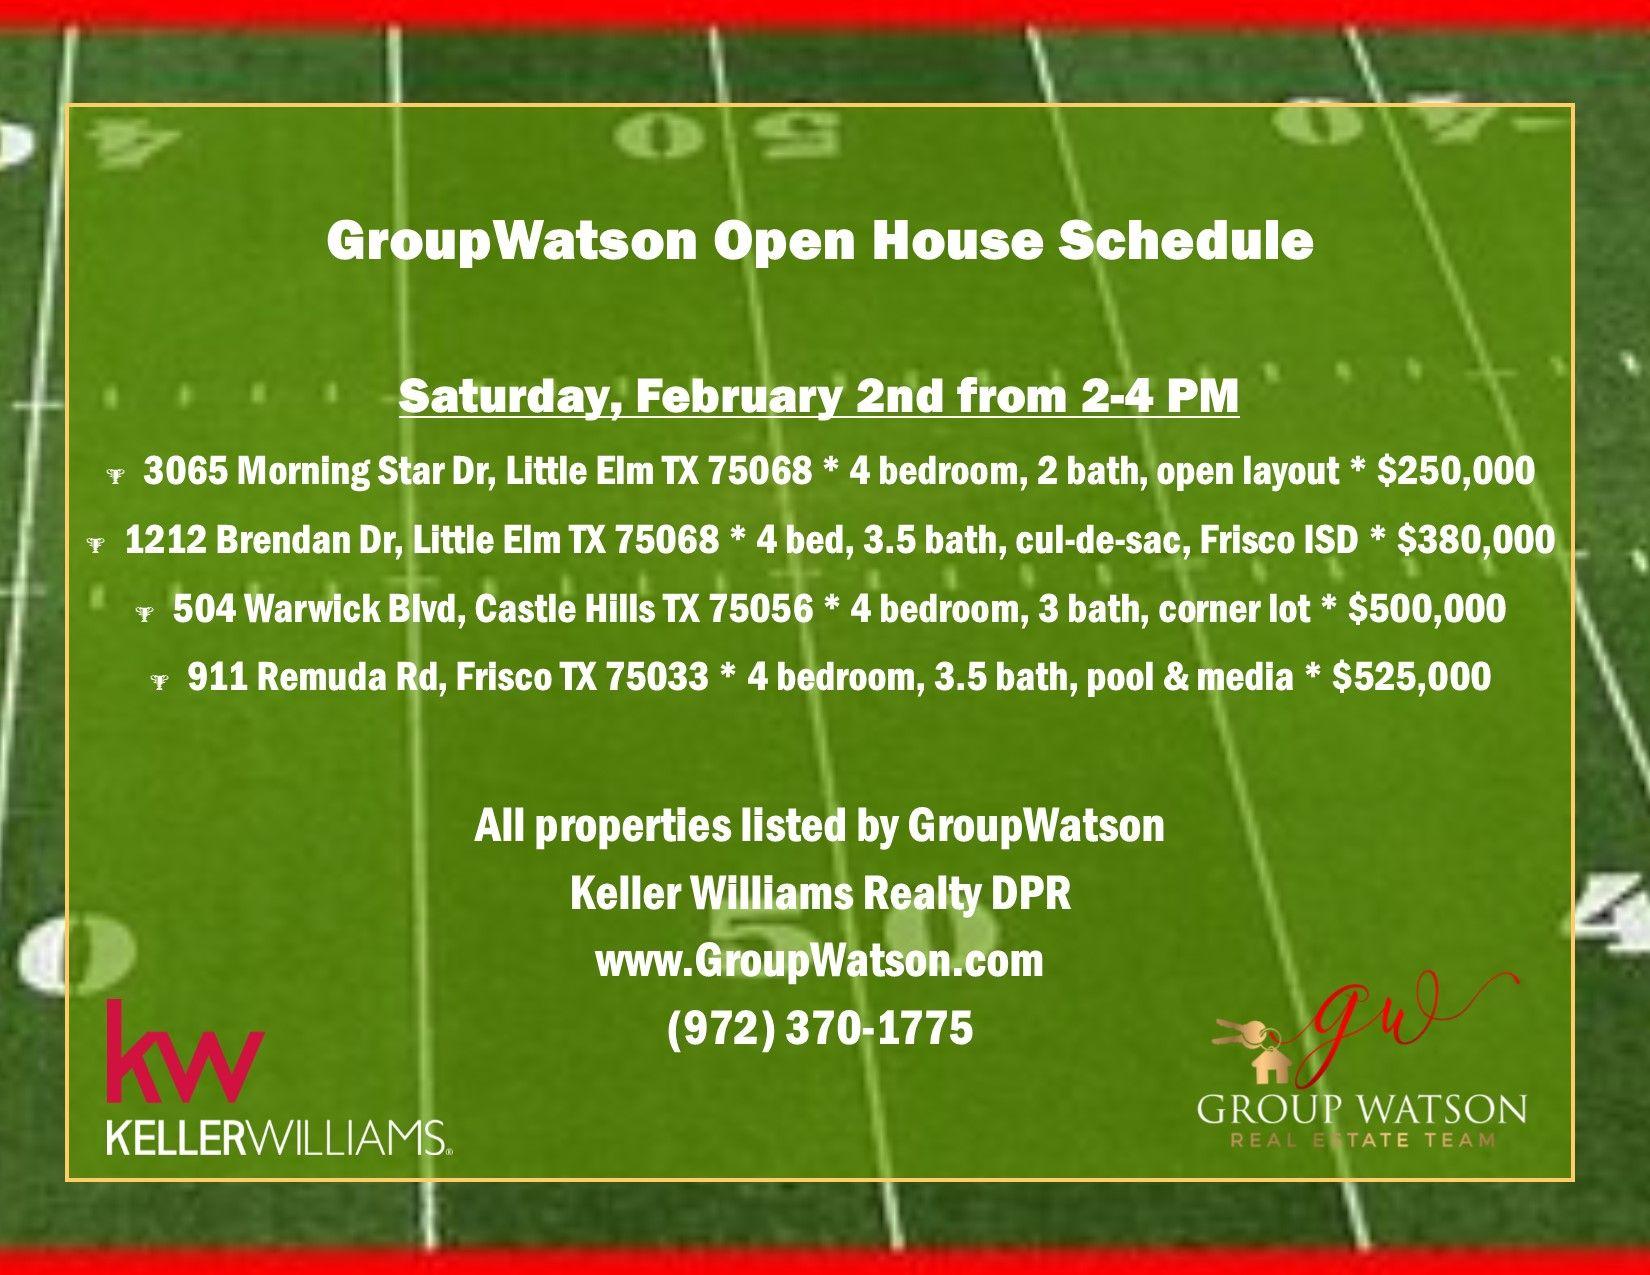 The Colony Texas Real Estate. GroupWatson, Keller Williams